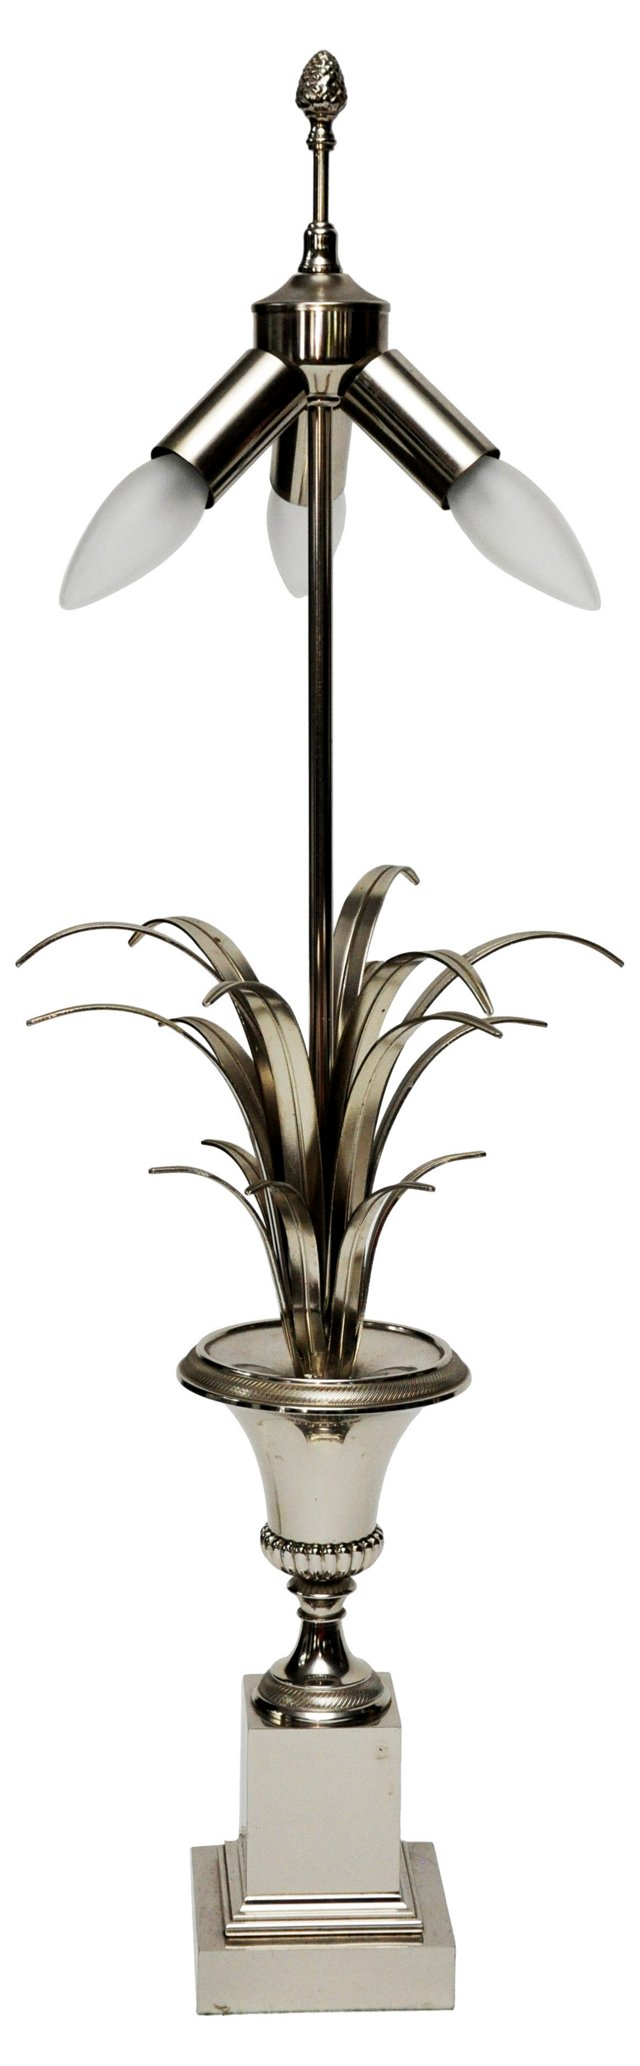 French Chrome Urn Lamp